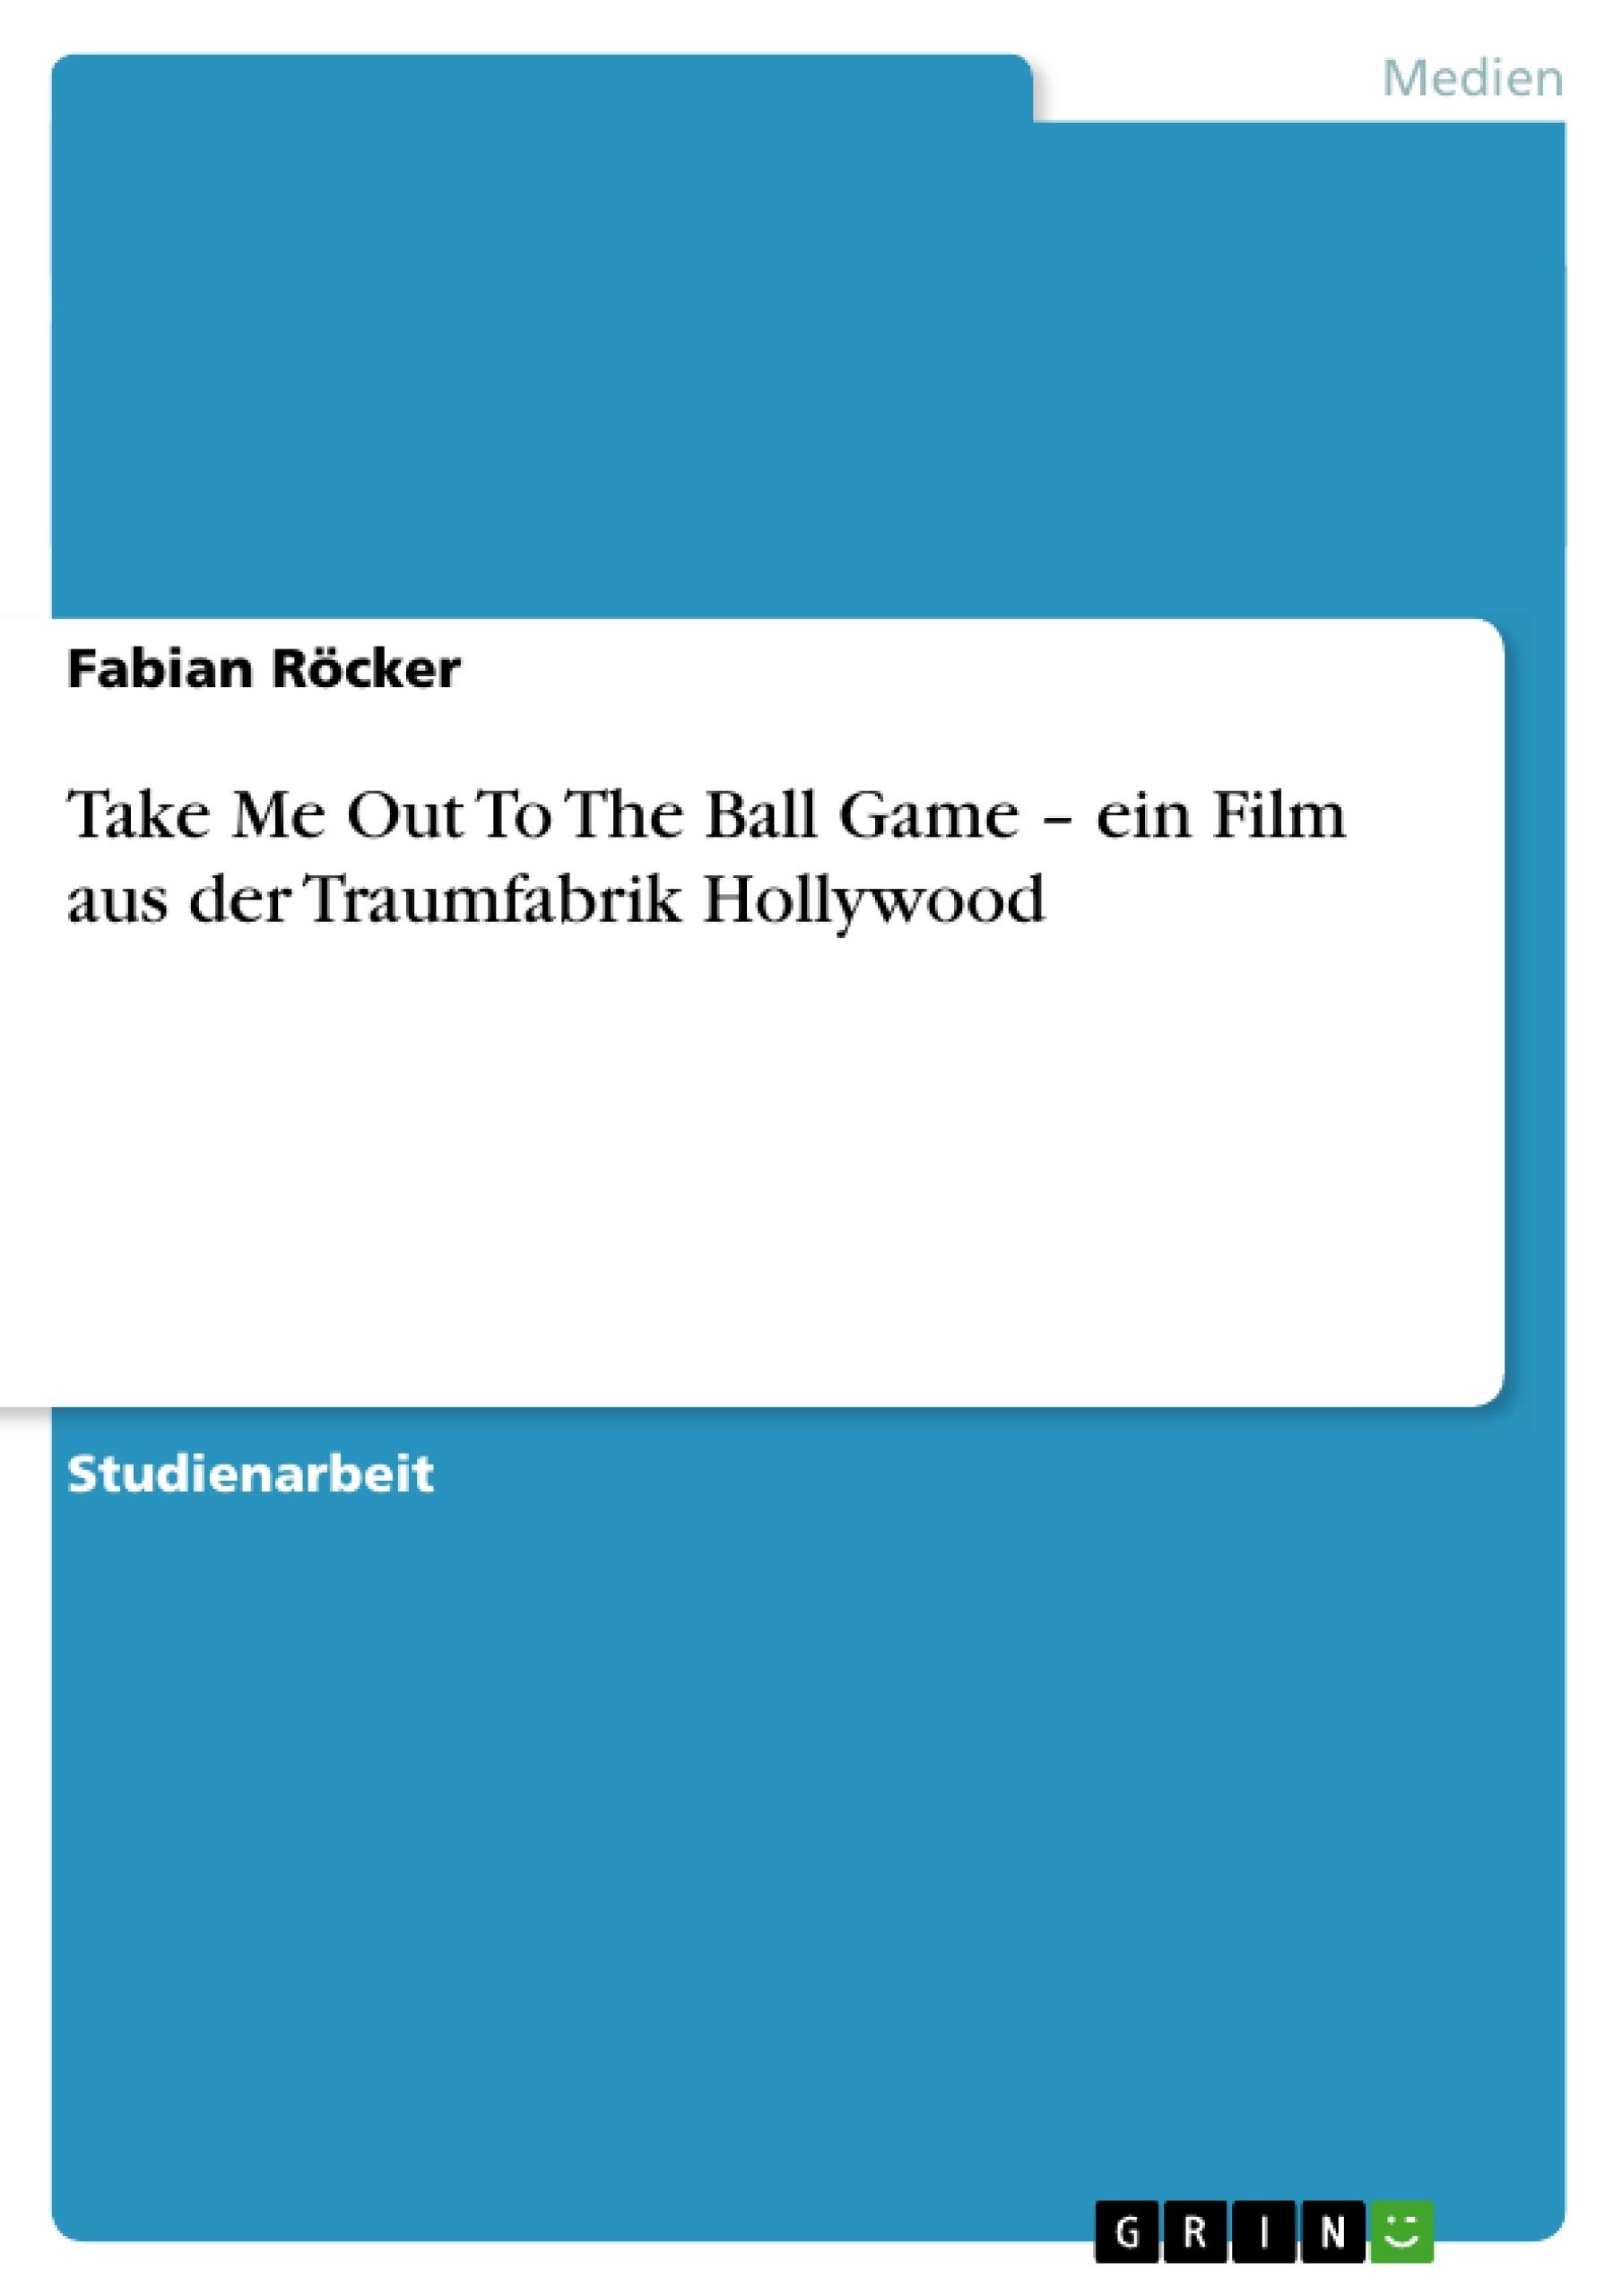 Titel: Take Me Out To The Ball Game – ein Film aus der Traumfabrik Hollywood